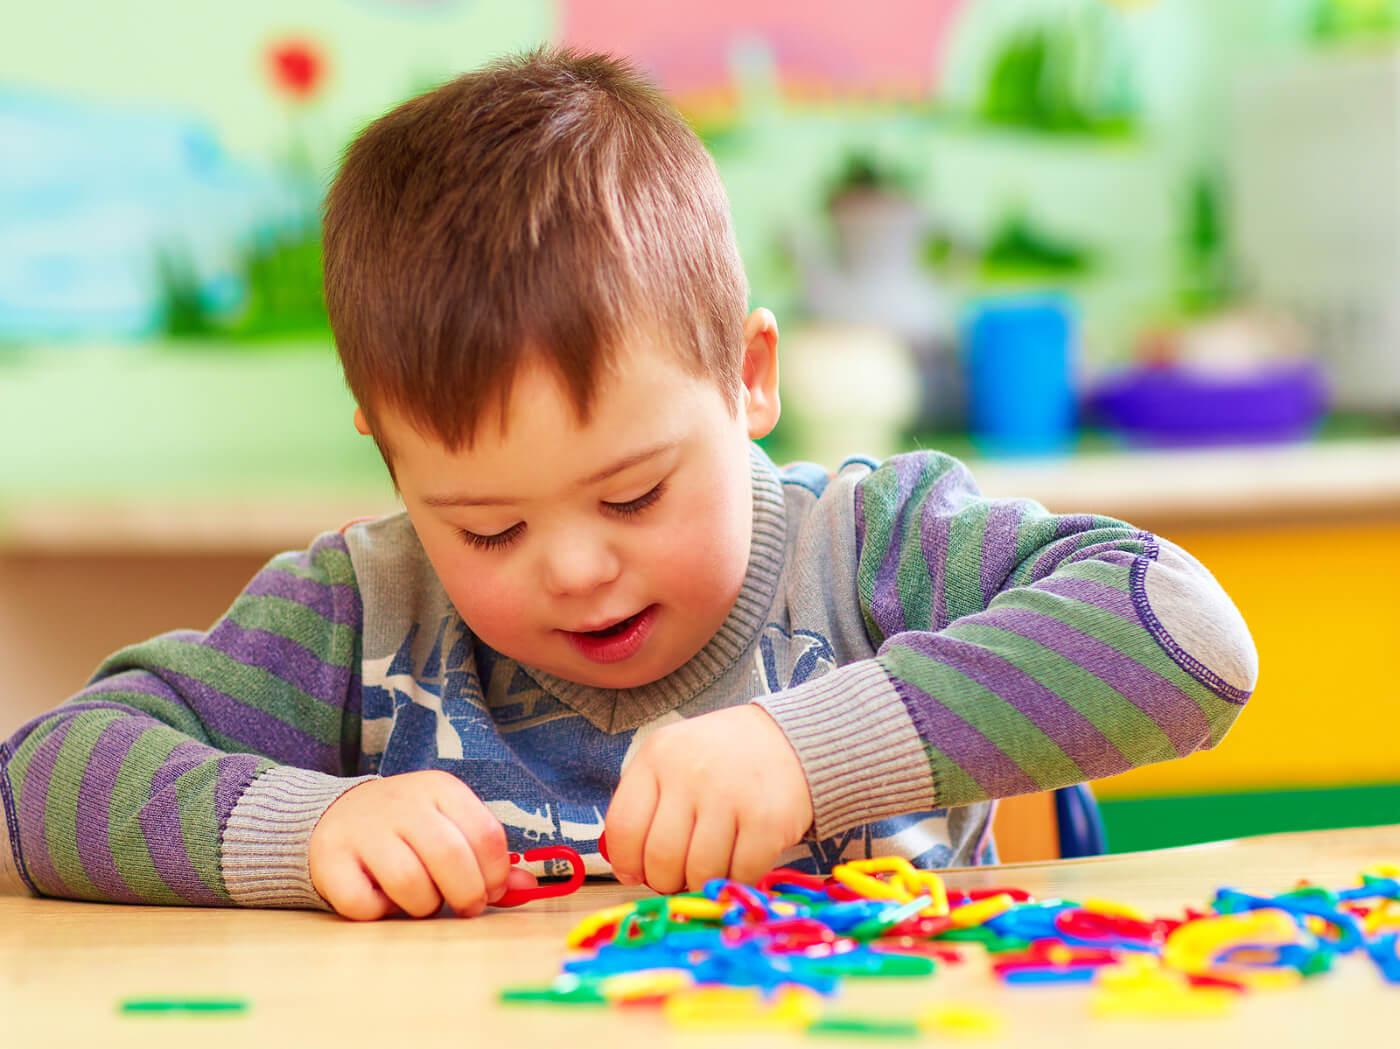 Niño con síndrome de Pitt-Hopkins jugando.